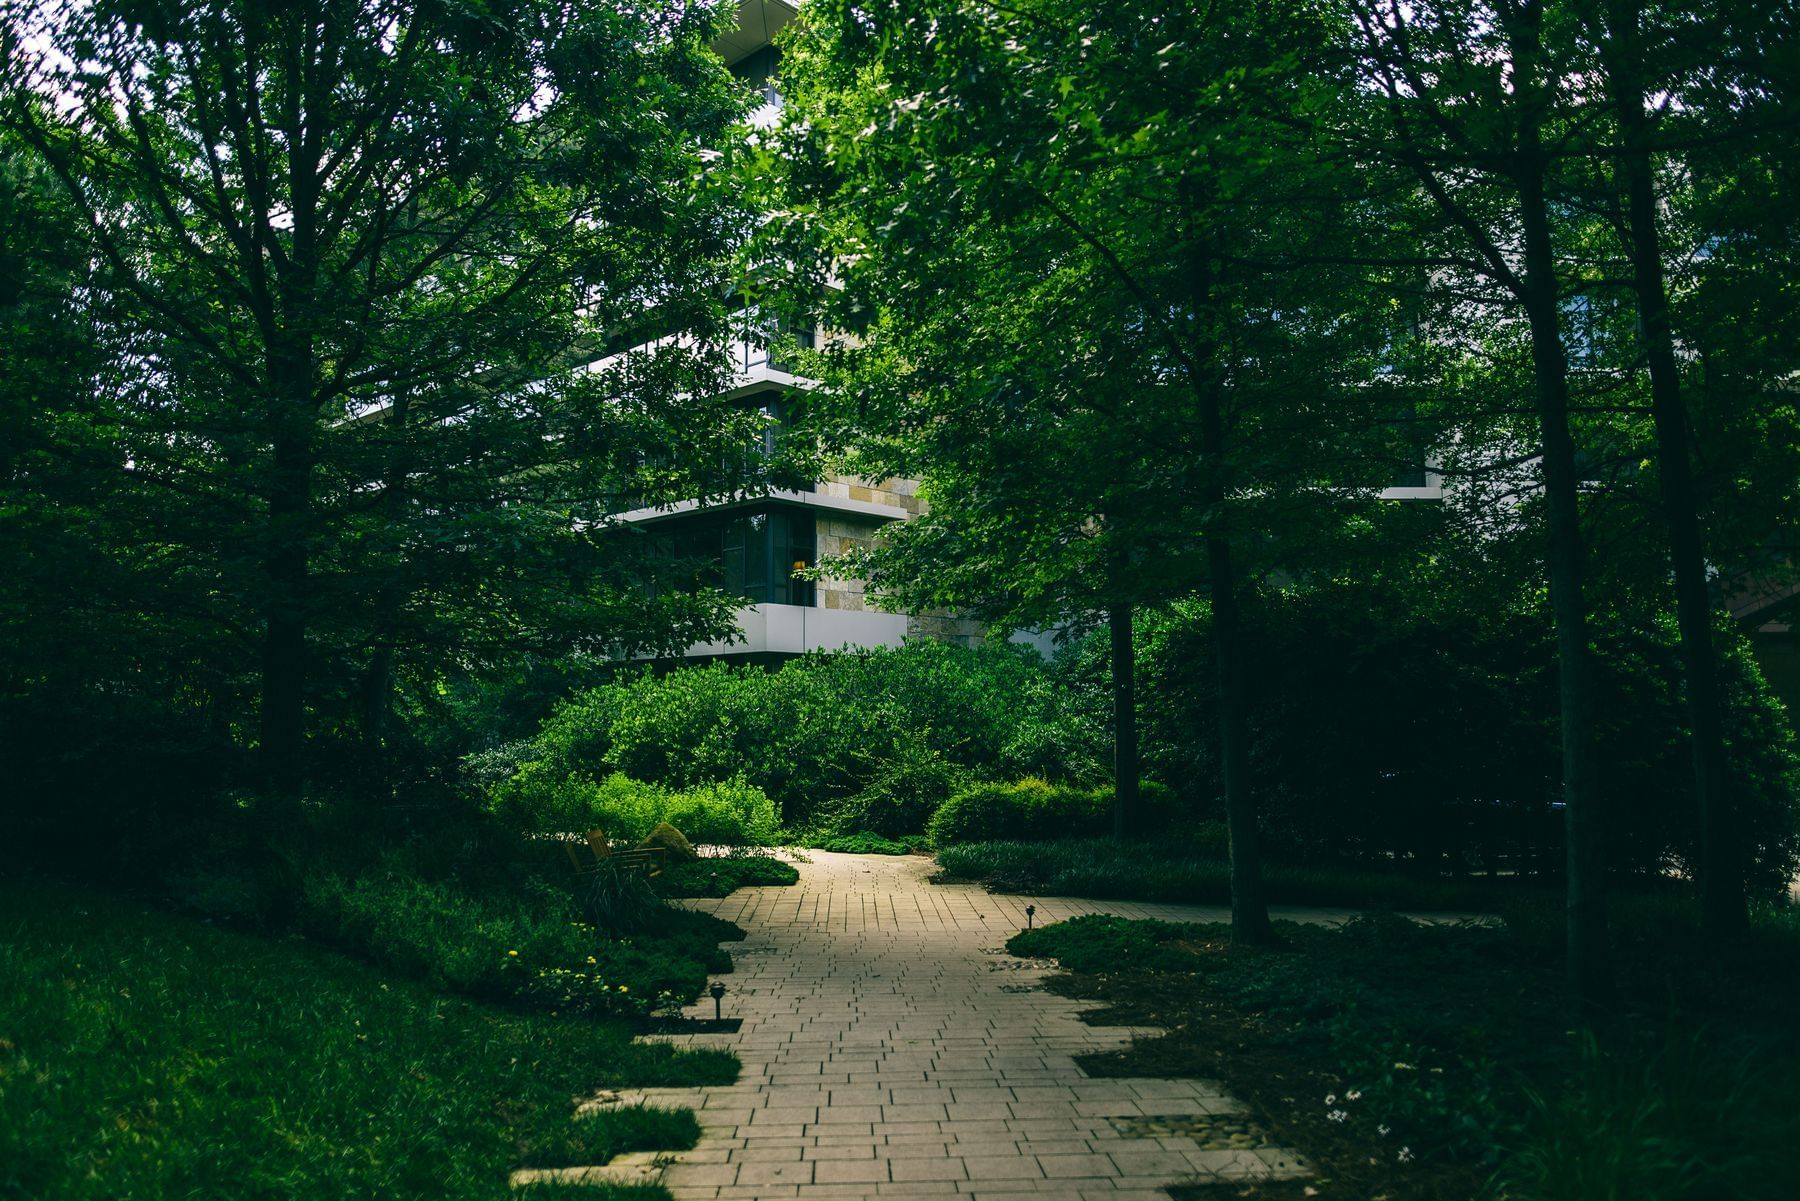 sidewalk path with trees